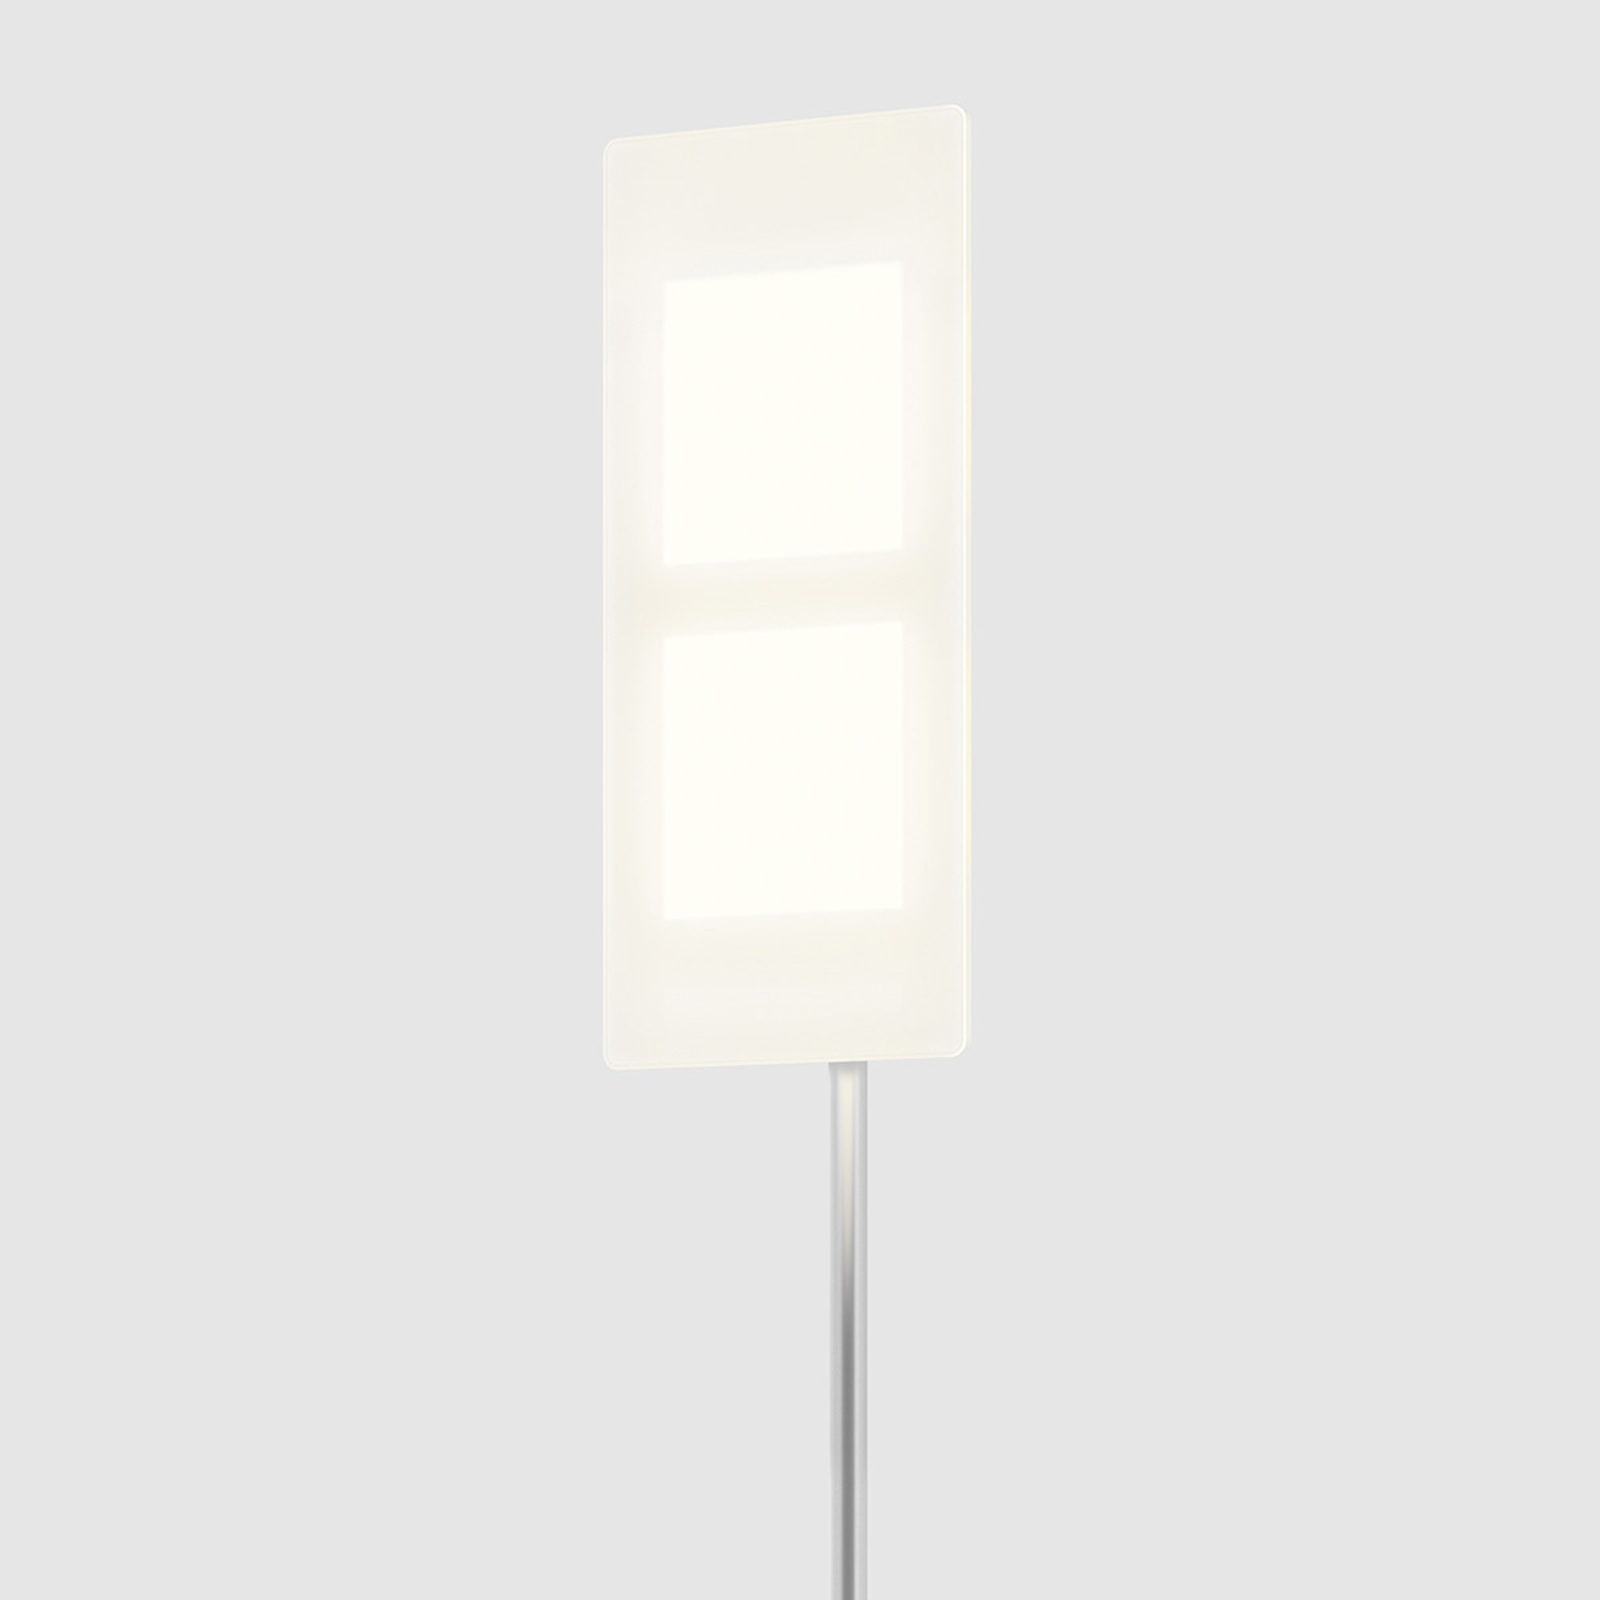 Mit OLEDs - Stehleuchte OMLED One f2 weiß